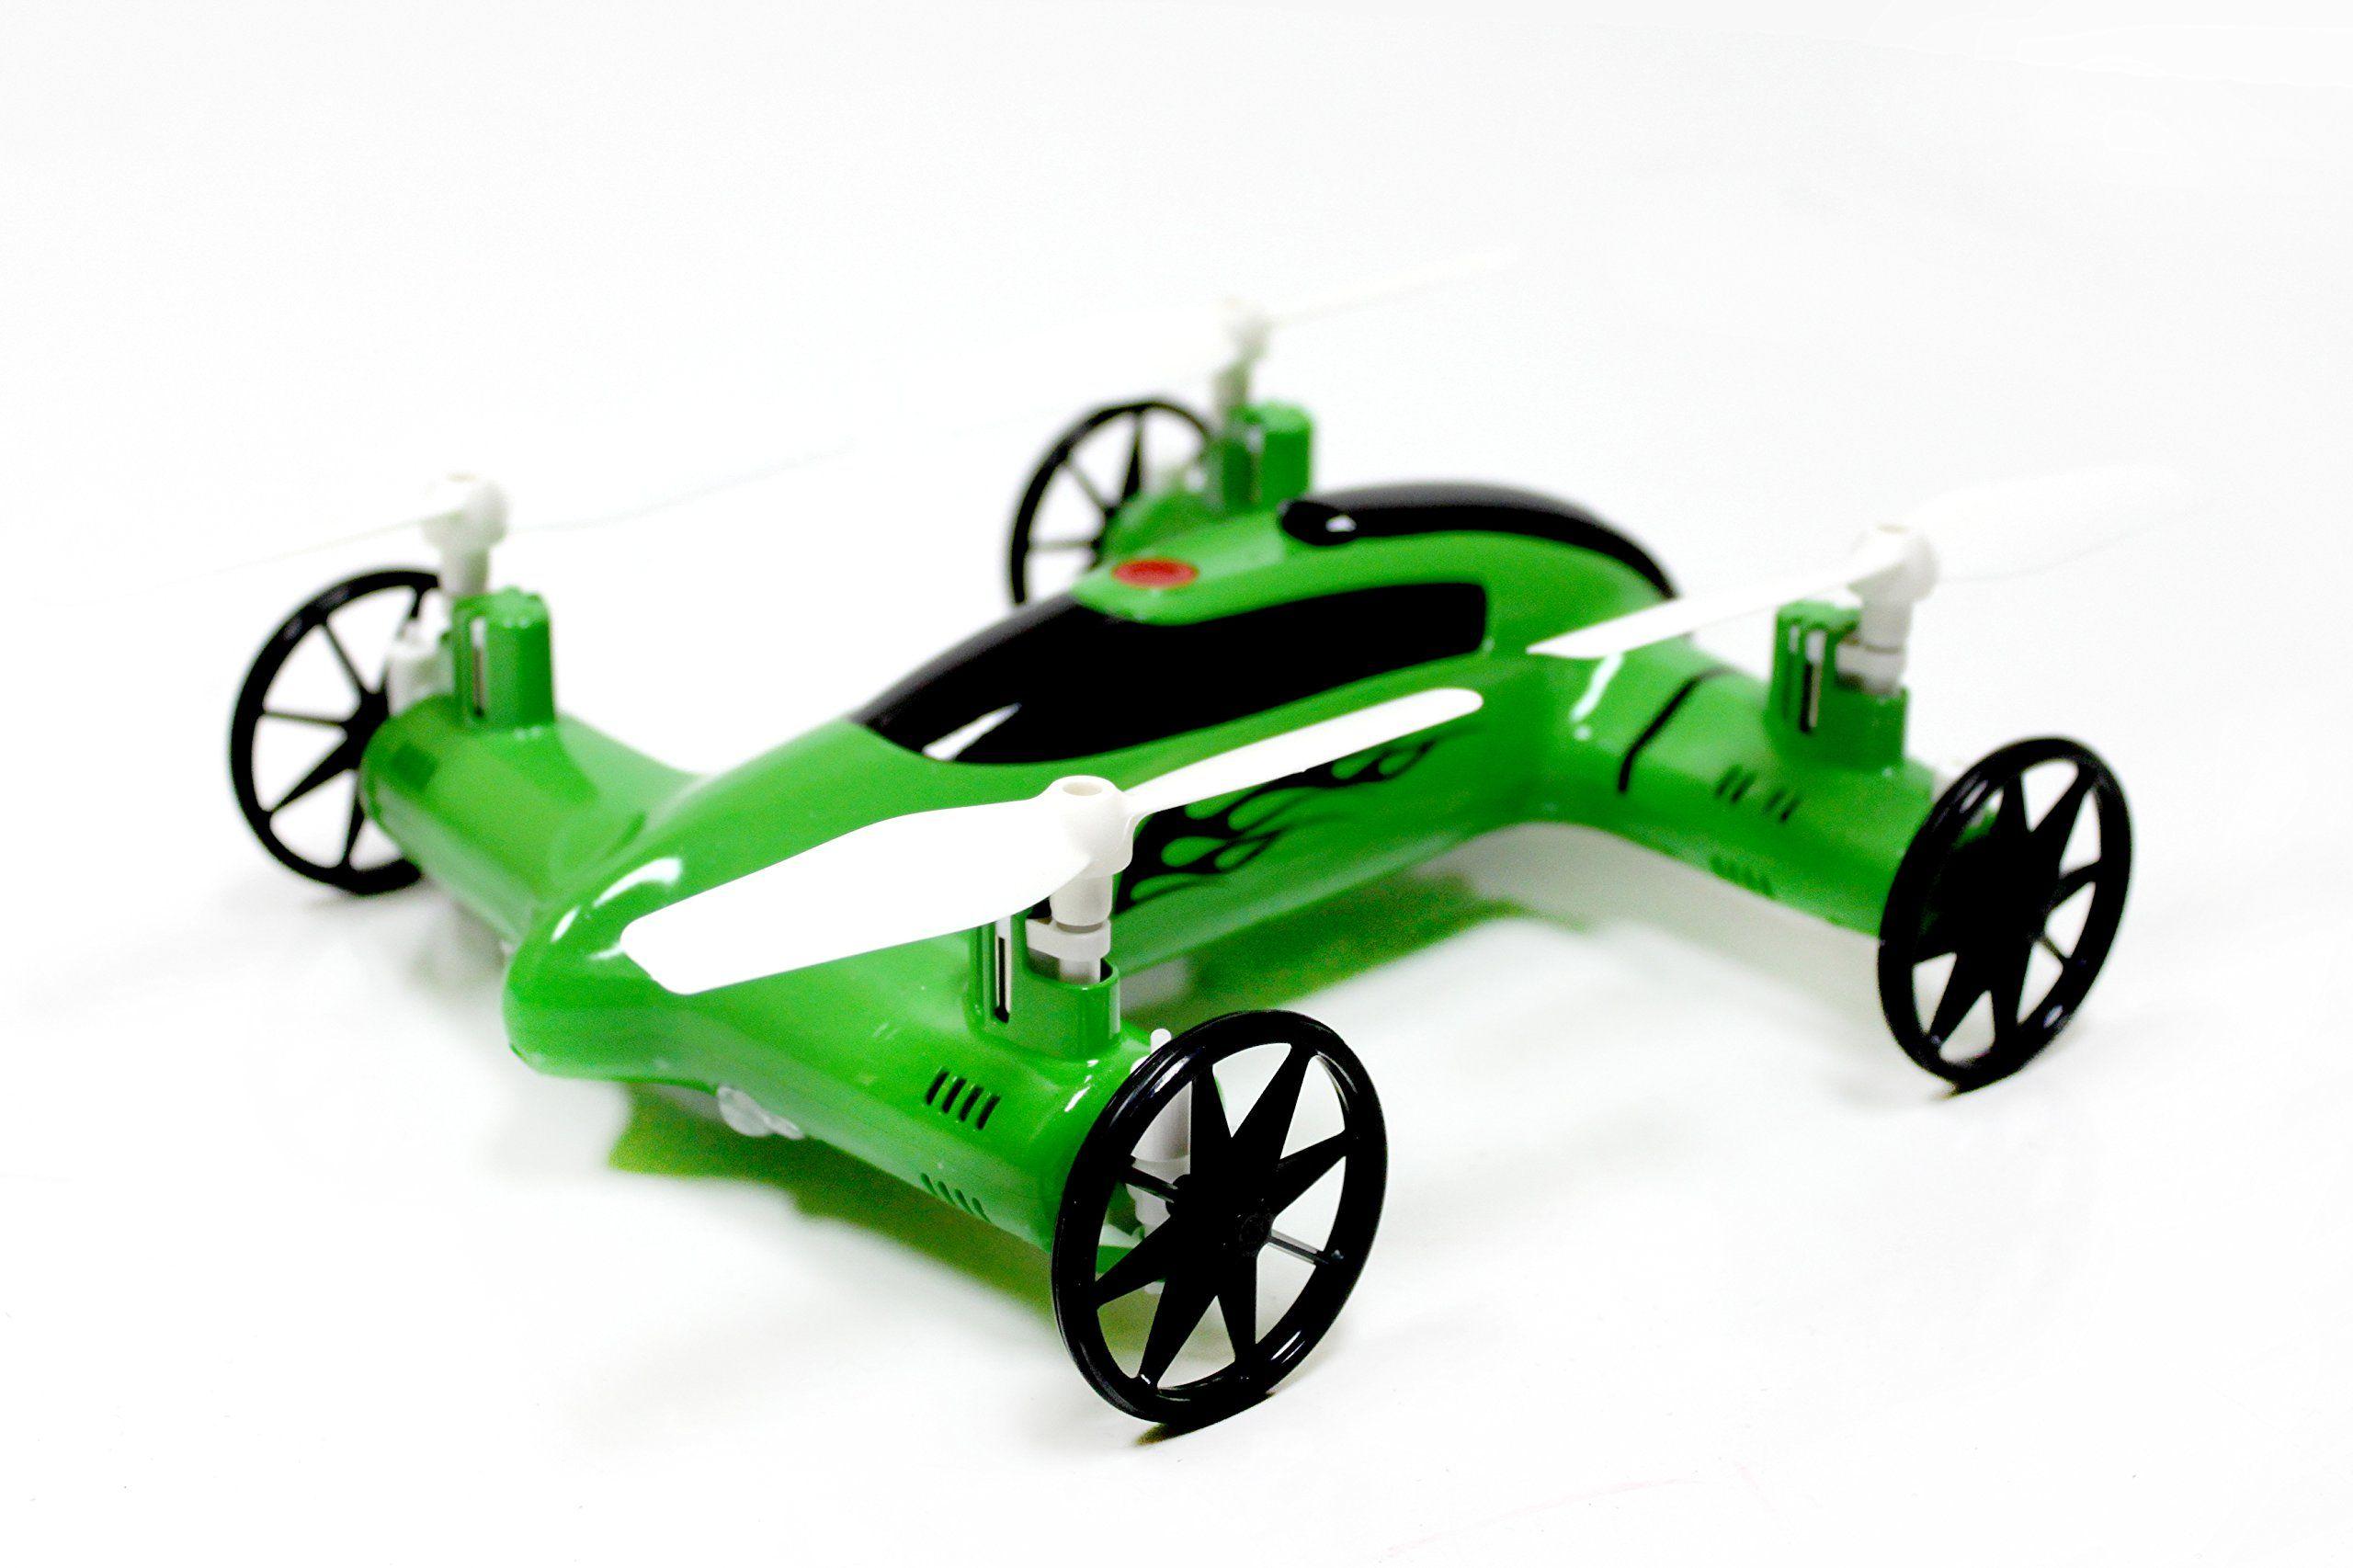 Syma X9 Flying Quadcopter Car Remote Control Car and